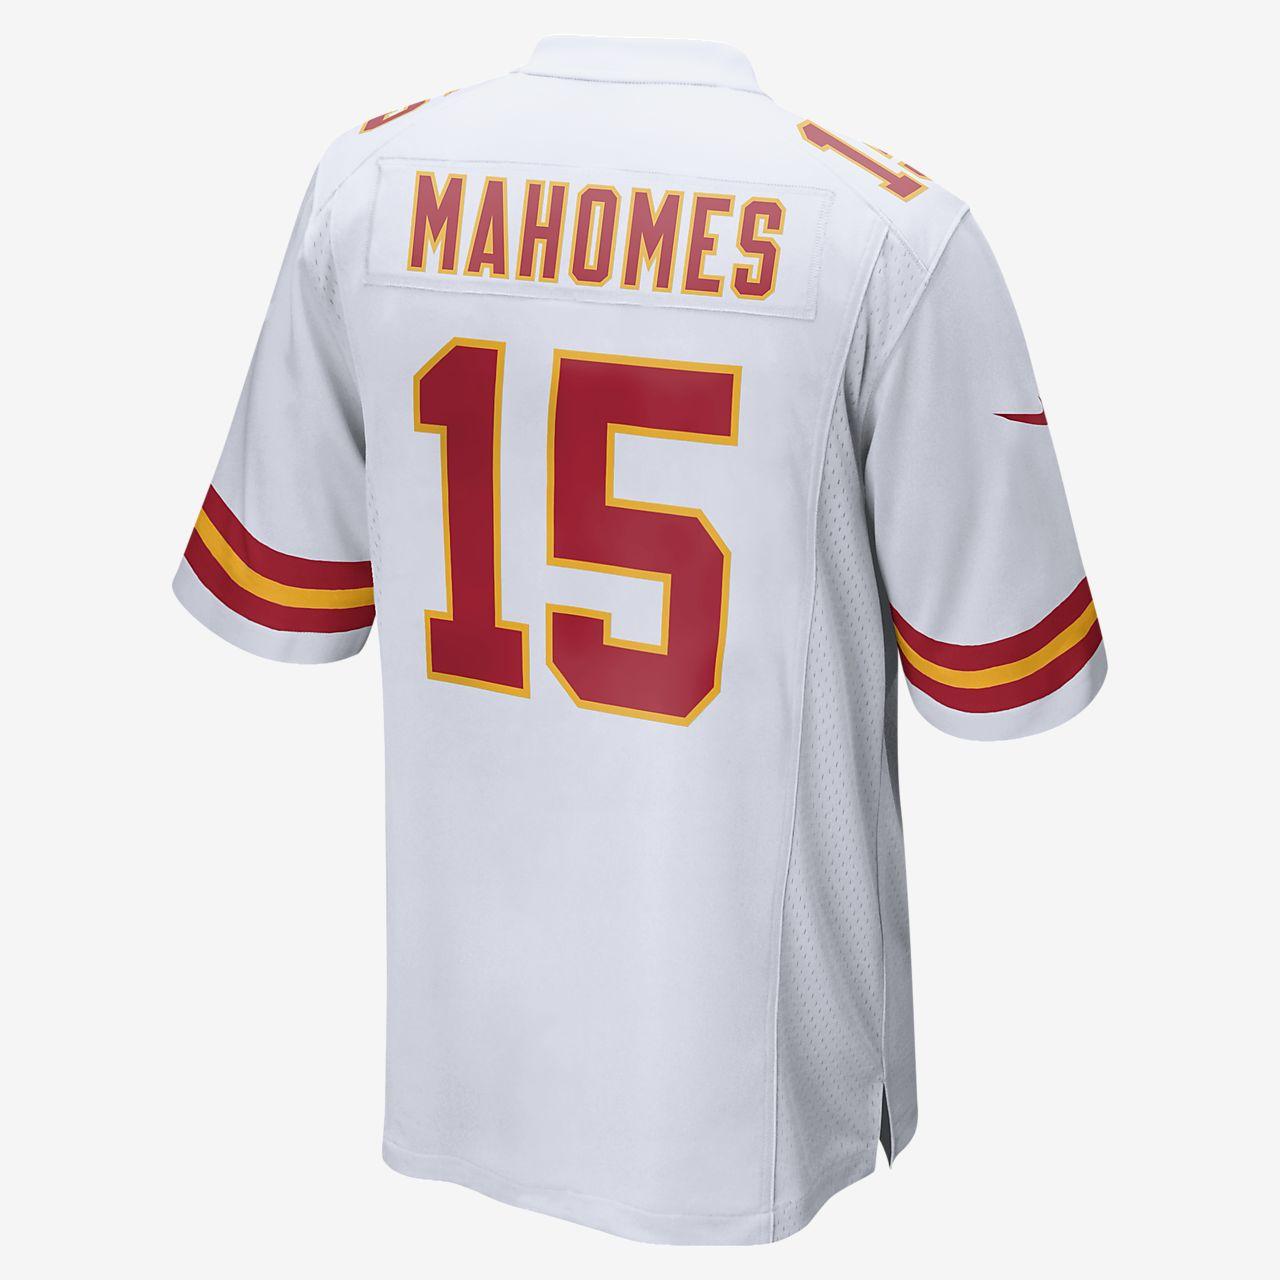 huge discount c6c44 9b91d NFL Kansas City Chiefs Game (Patrick Mahomes) Men's Football Jersey